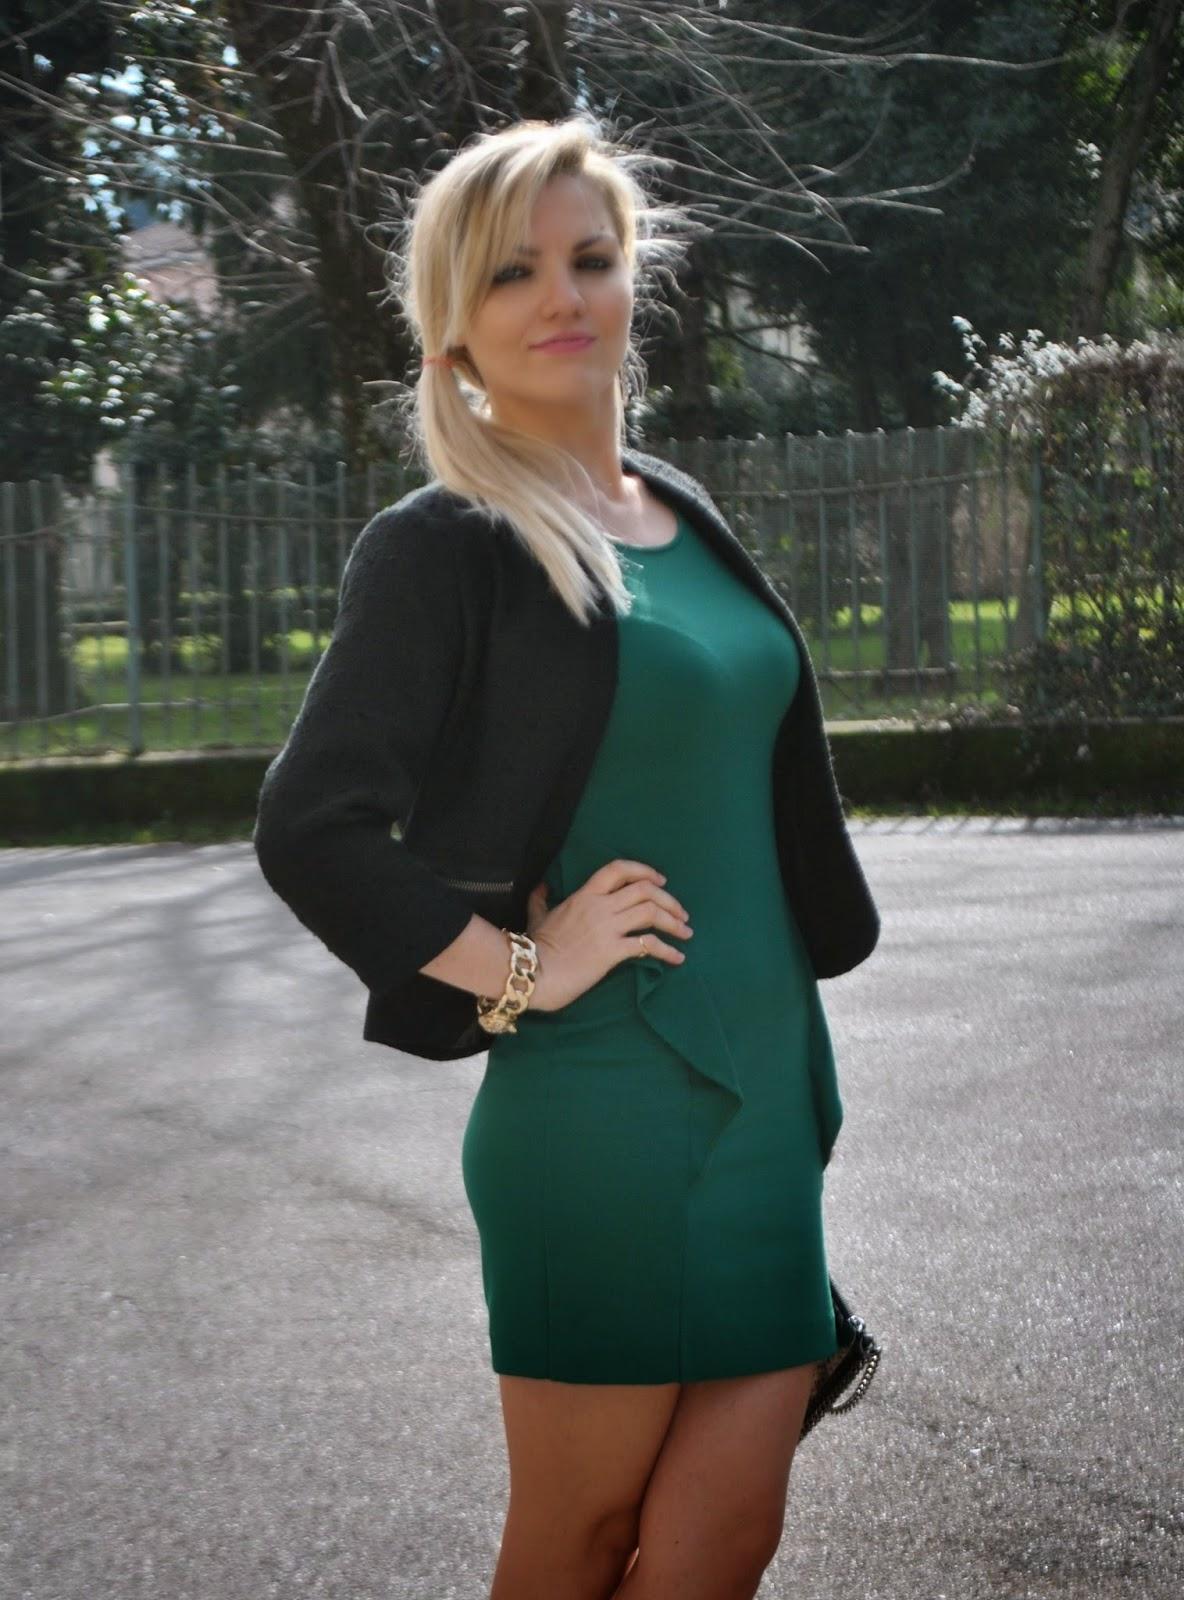 outfit abito verde bottiglia outfit elegante invernale outfit invernali  outfit invernale da donna elegante outfit verde a574dcc3551